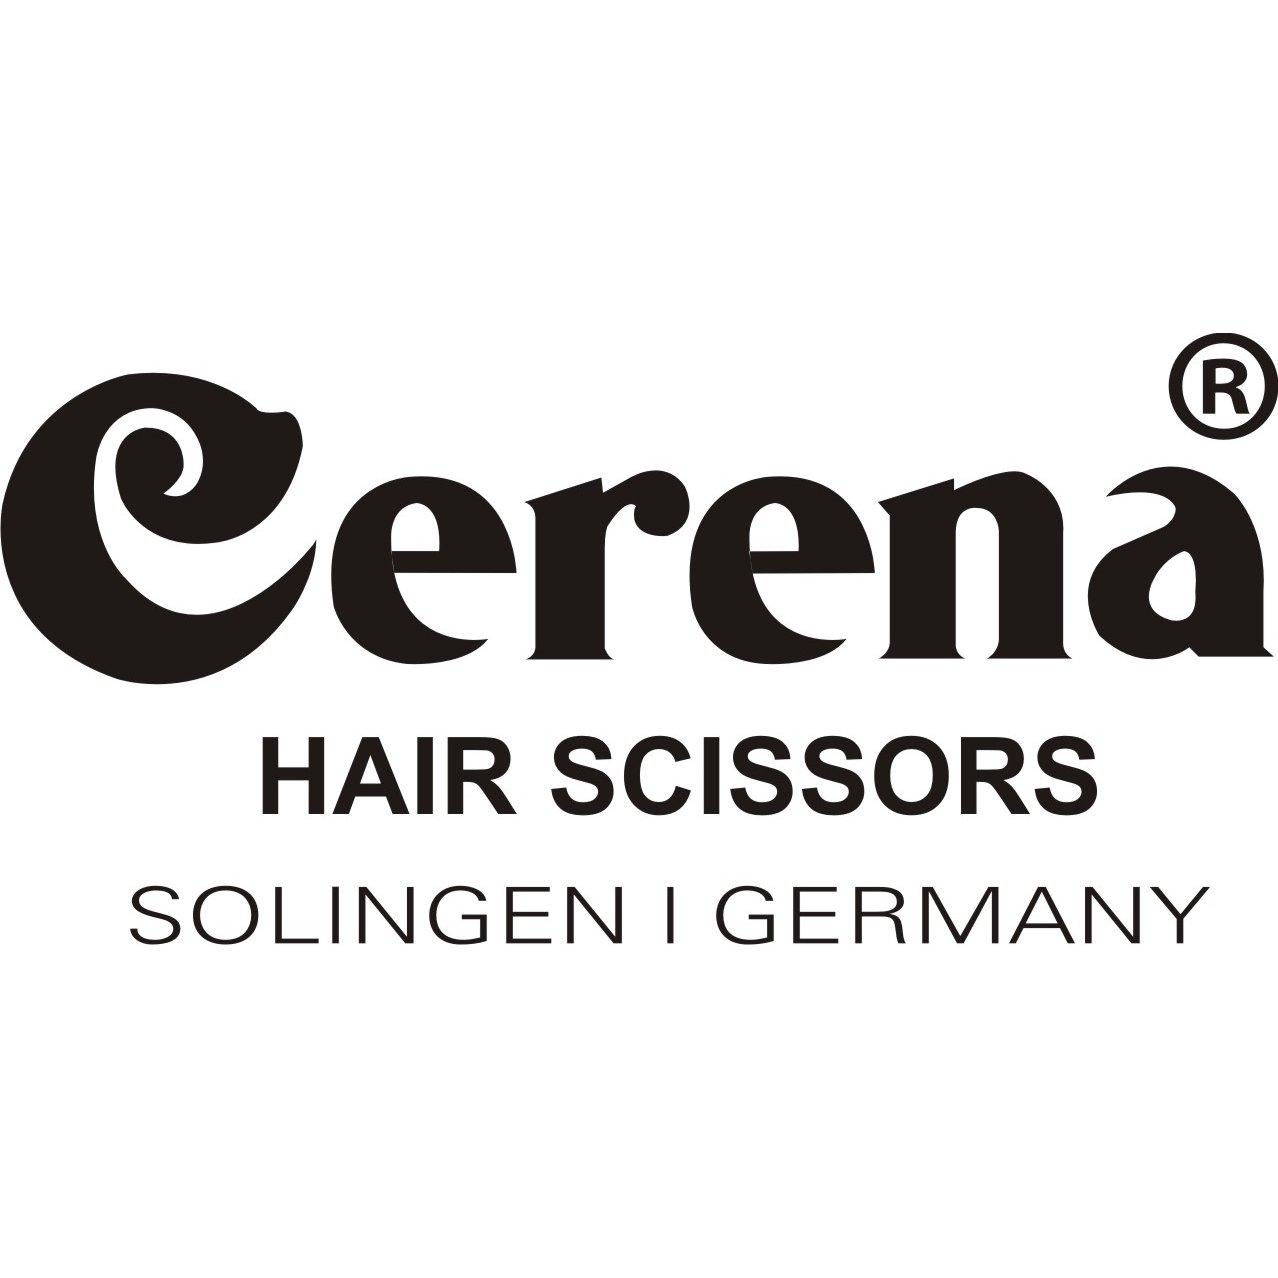 Cerena Solingen